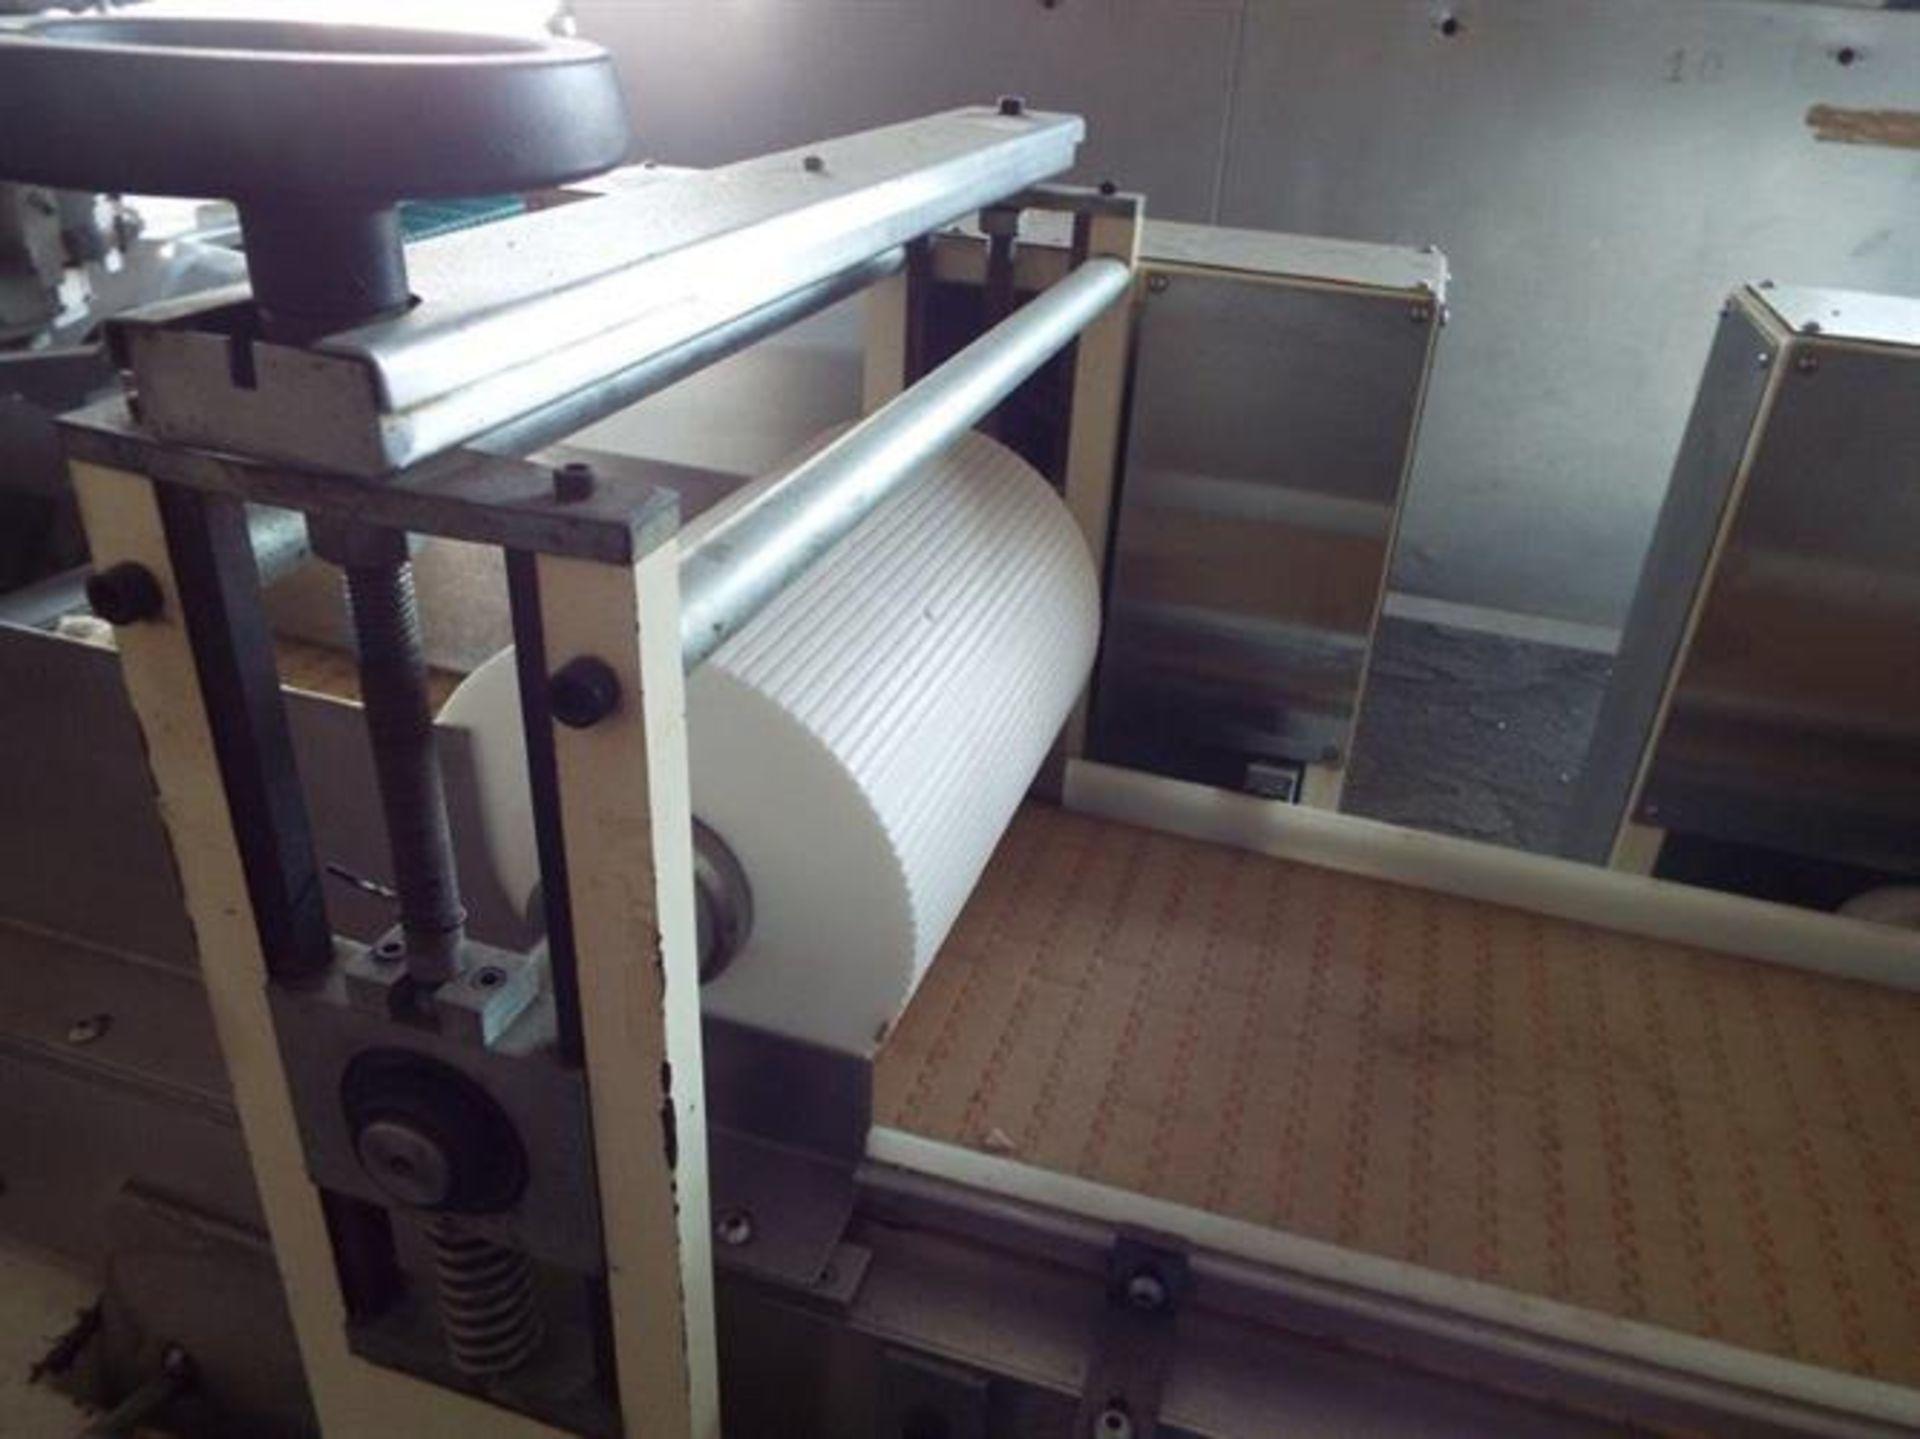 Tecmaq 290 mm Wide Slab Forming Line - Model TM-6H built 2012 - Three sets of gauging/sheeting - Image 13 of 30